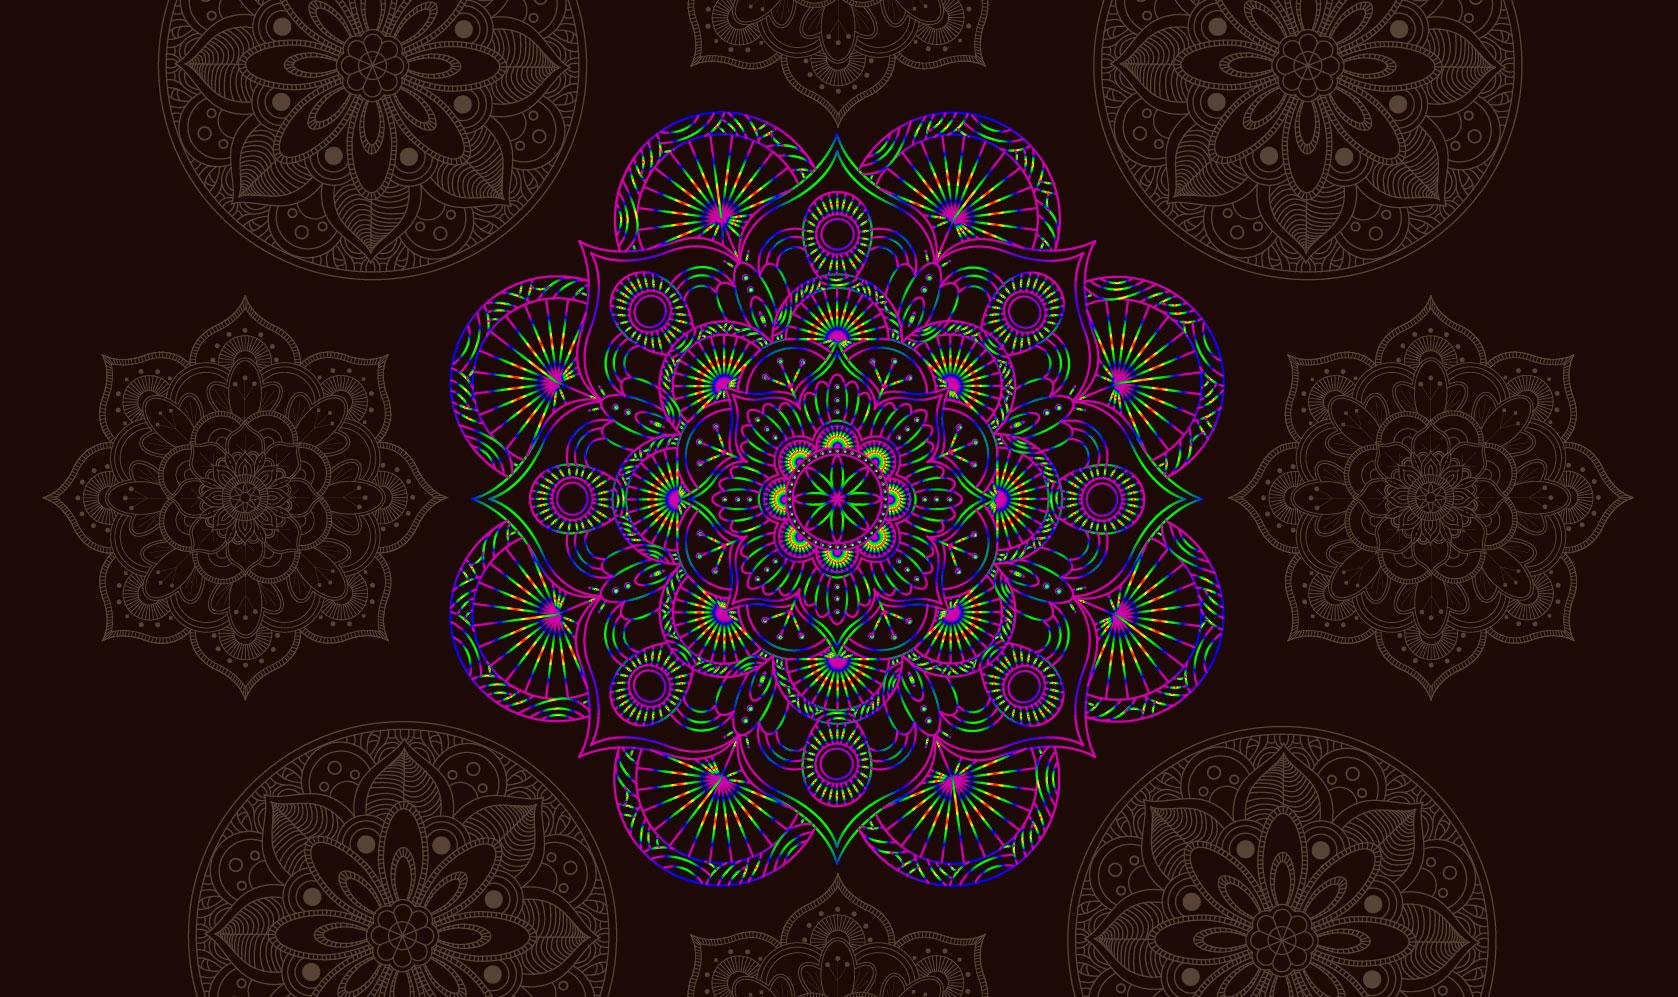 La geometria sagrada del corazon